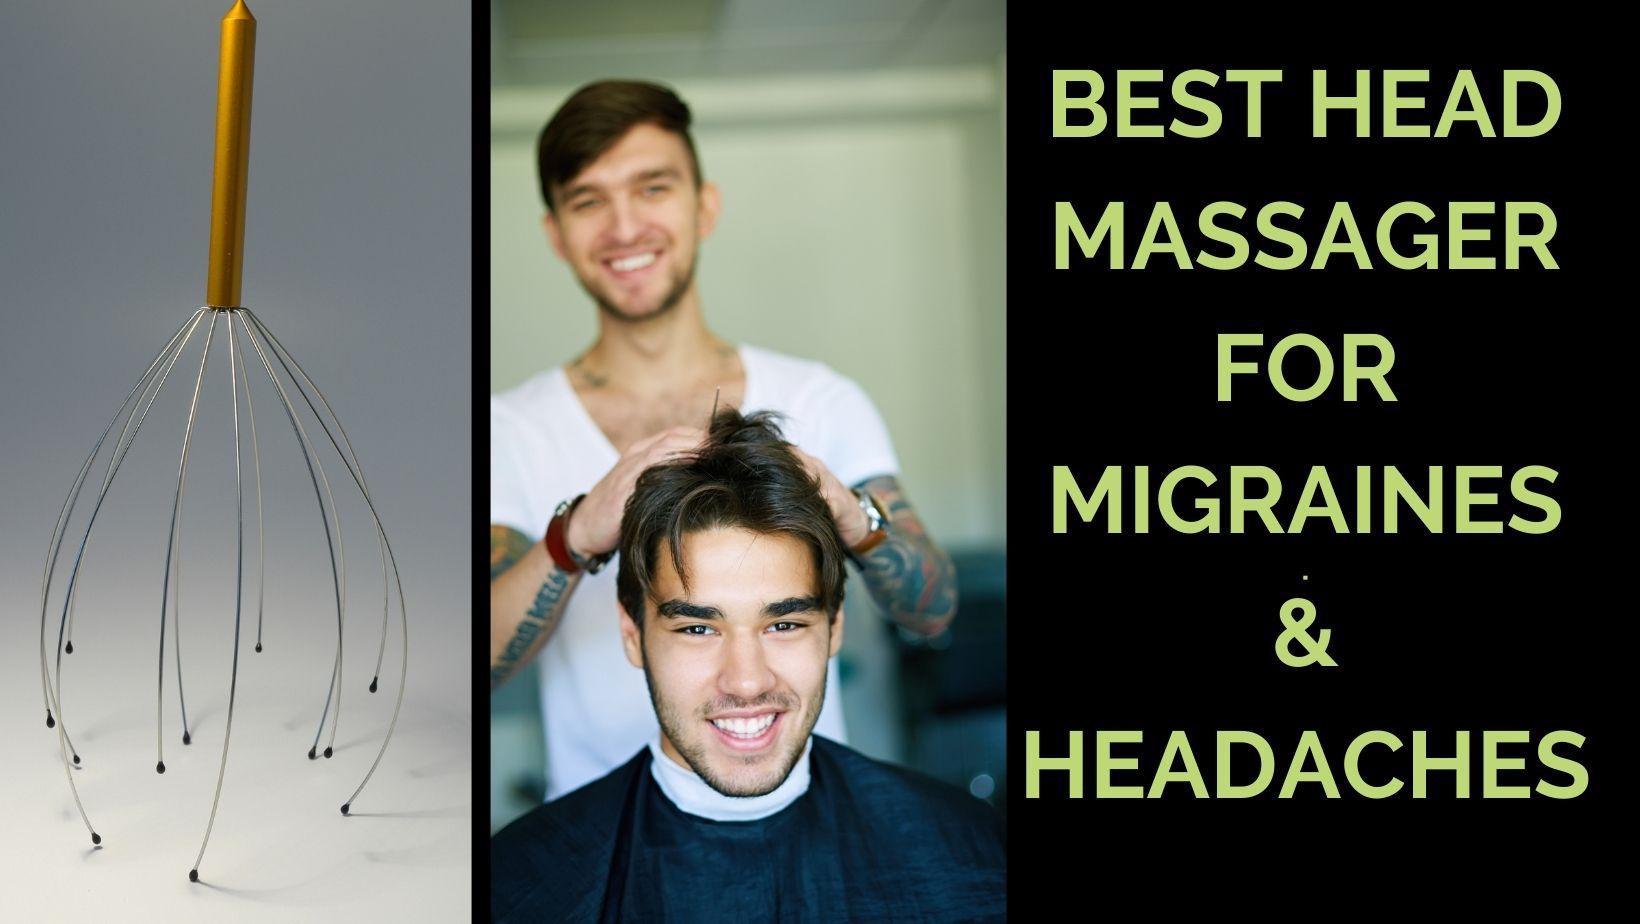 Best Head Massager For Migraines & Headaches